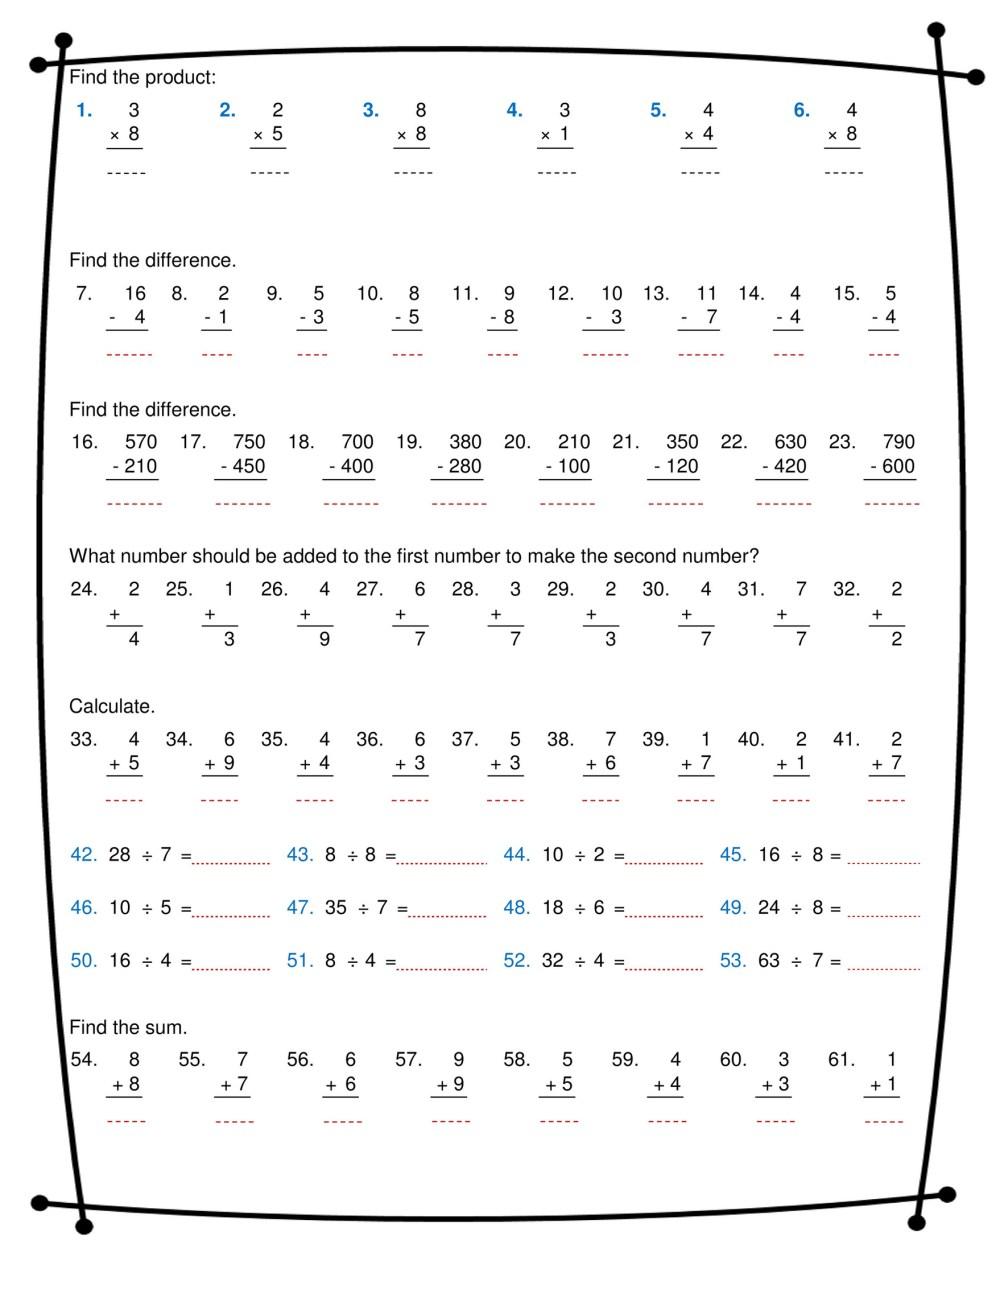 medium resolution of ninalazina - addition subtraction multiplication division worksheets pdf  Upload V2 - Page 1 - Created with Publitas.com